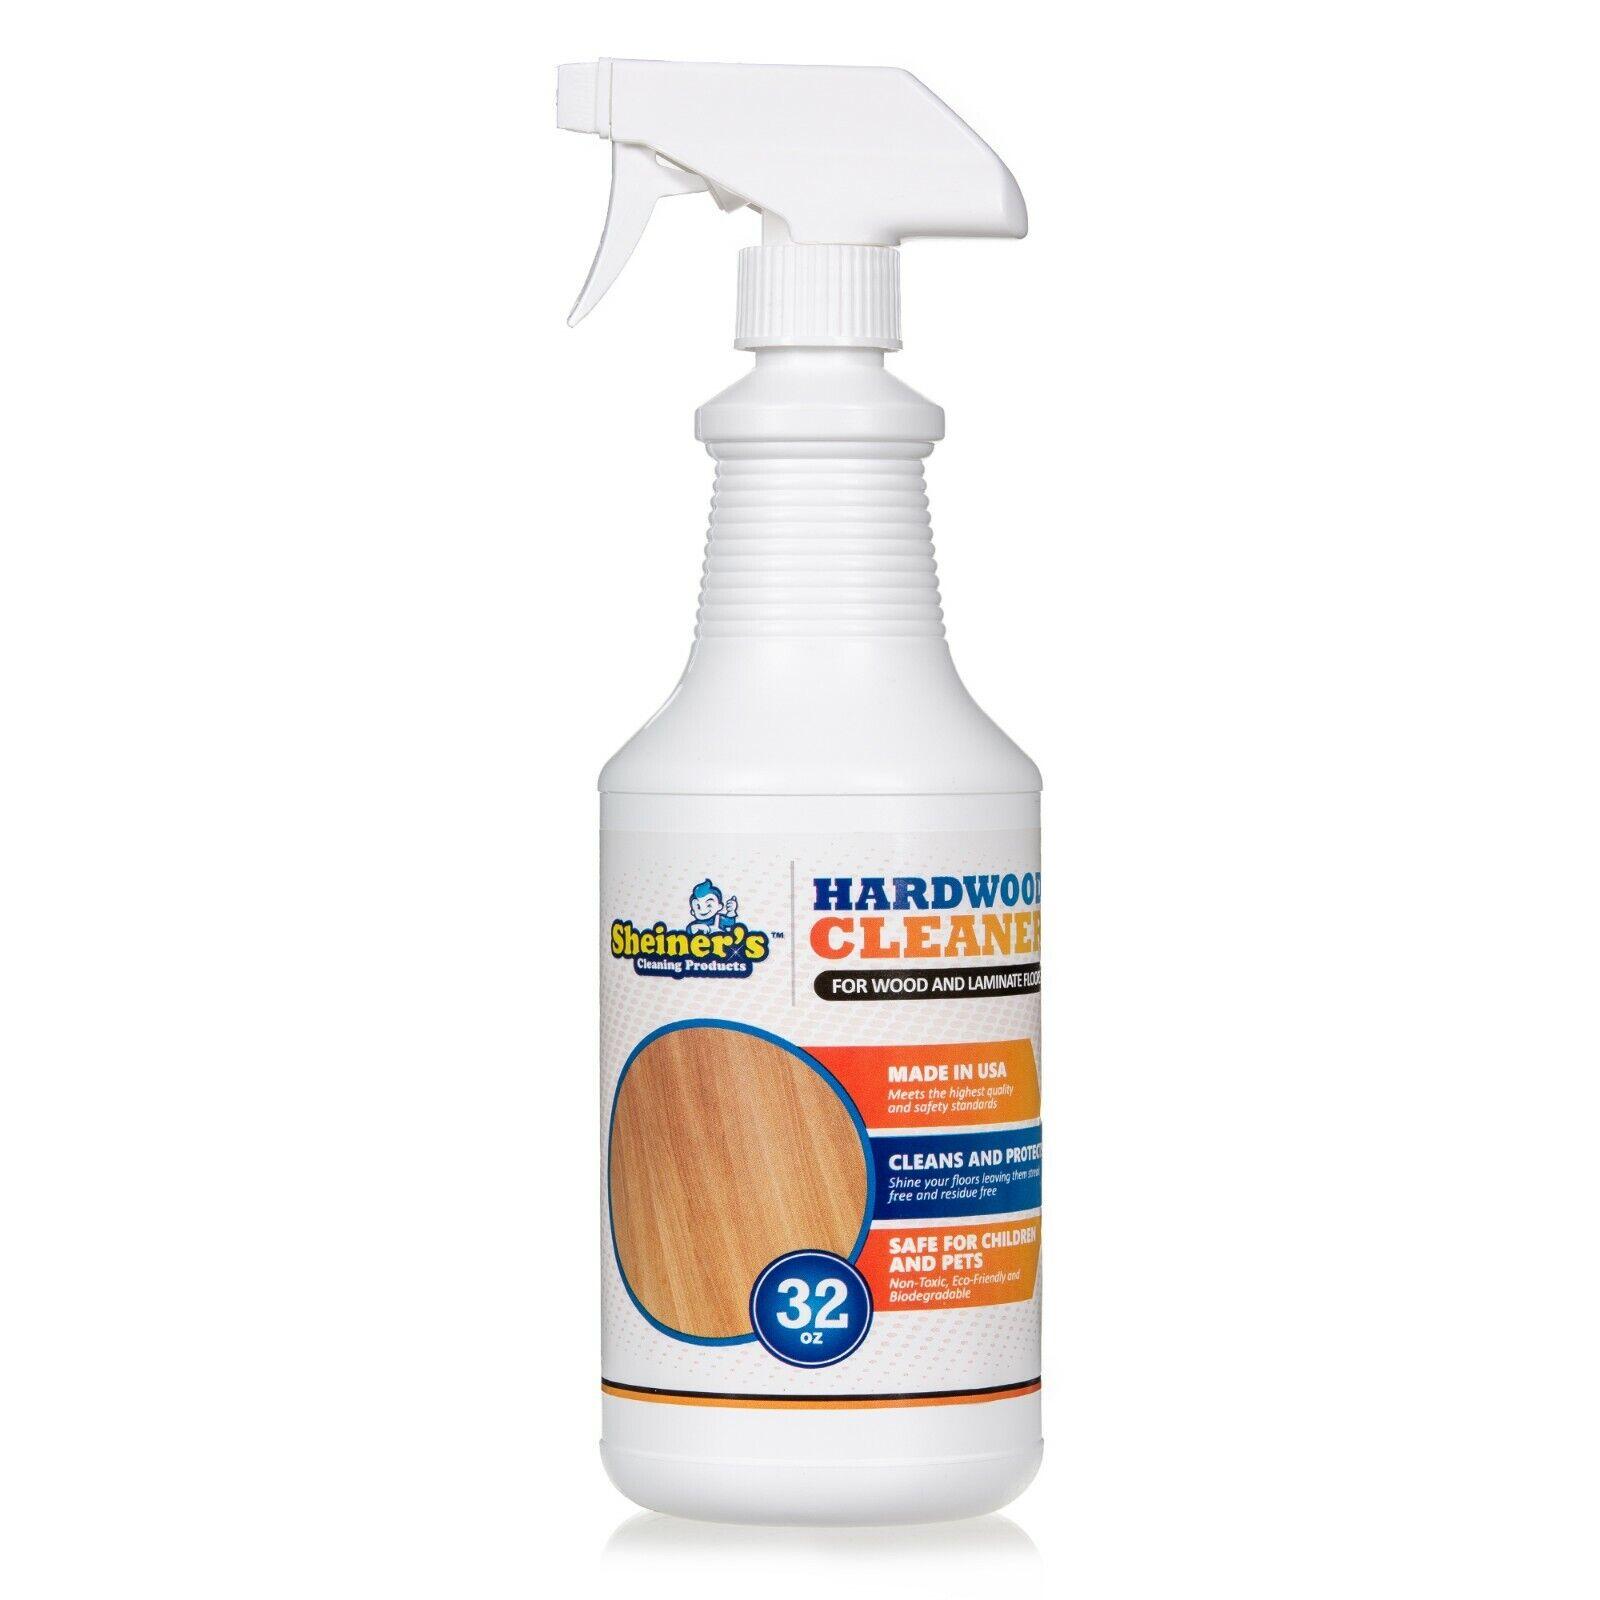 Effeclean Eco Hardwood Floor Cleaner By Tradeinbay Best Quality